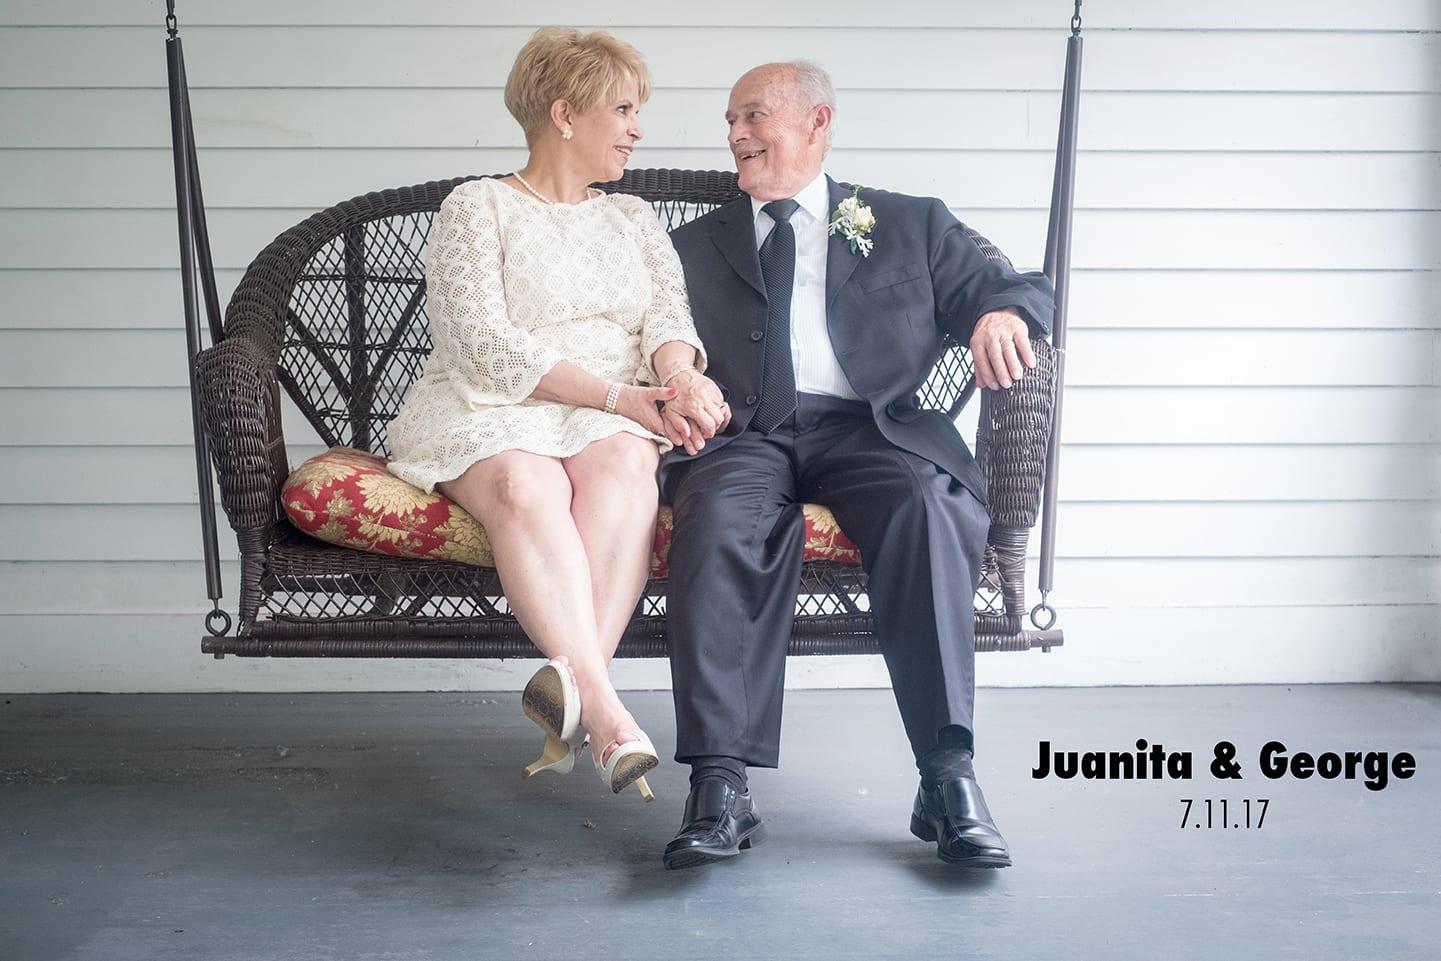 Juanita and George wedding photography.